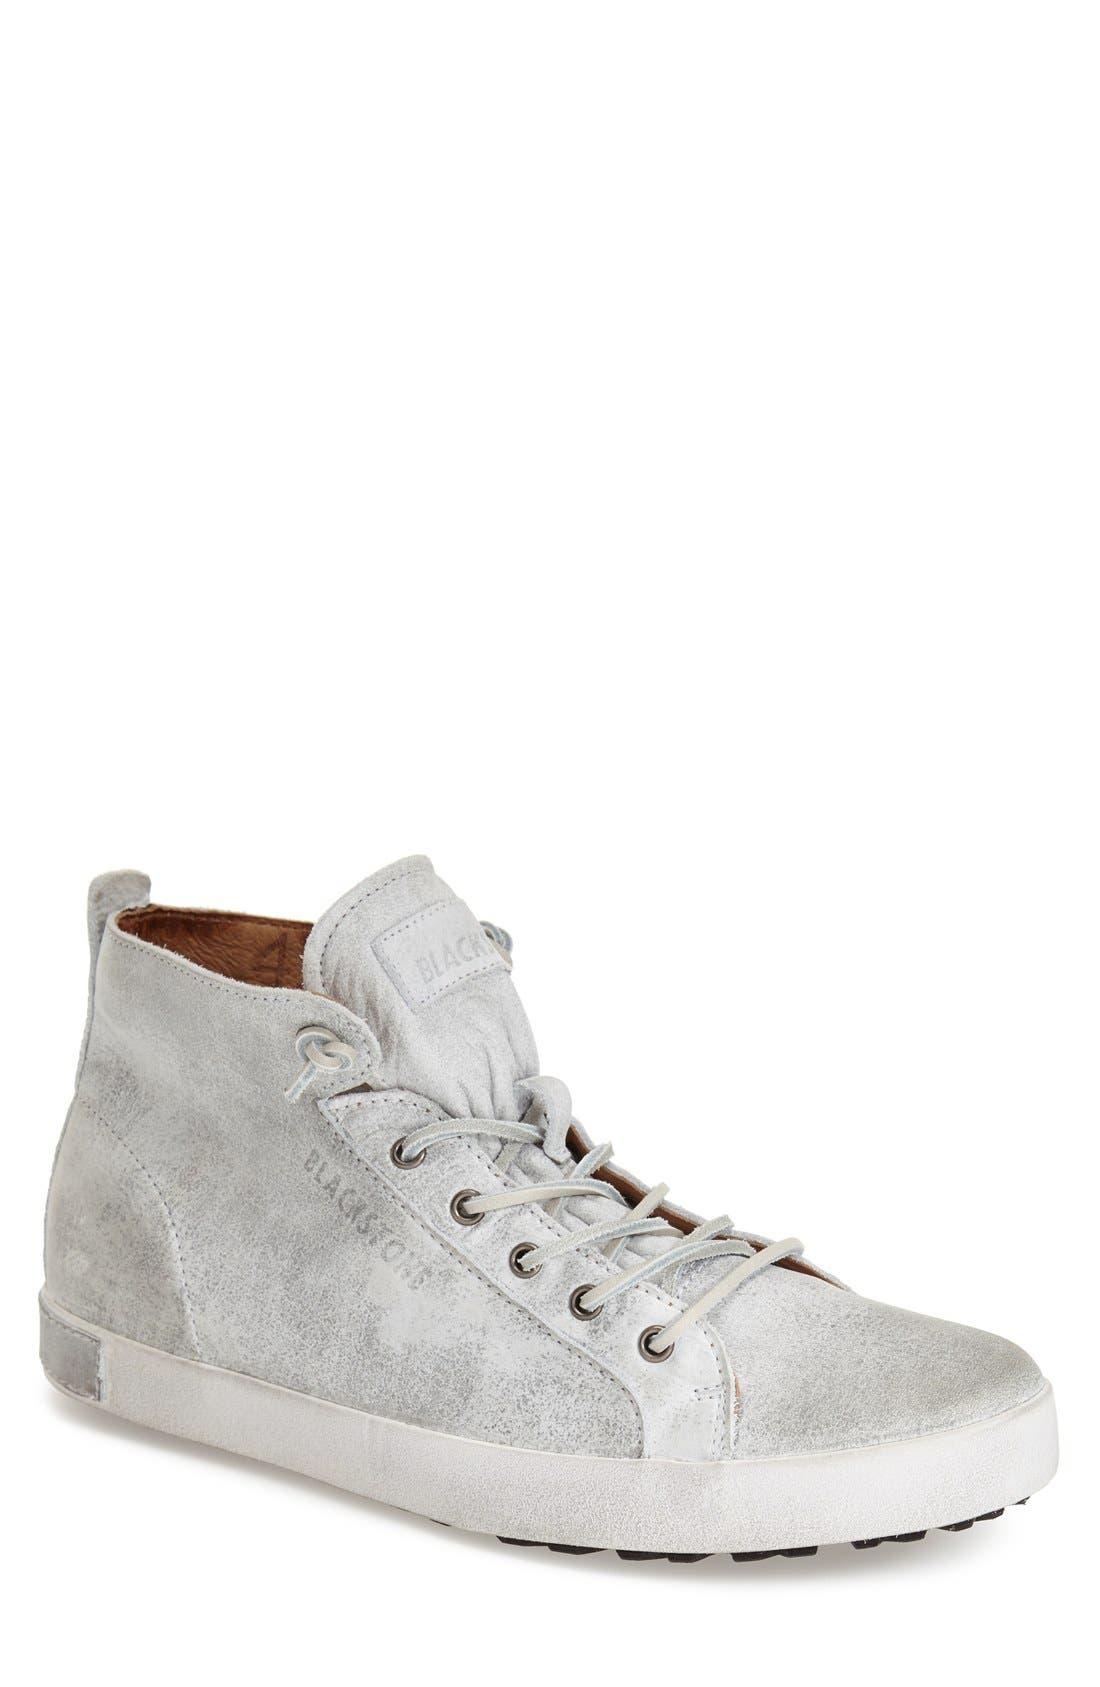 'JM 02' High Top Sneaker,                             Main thumbnail 1, color,